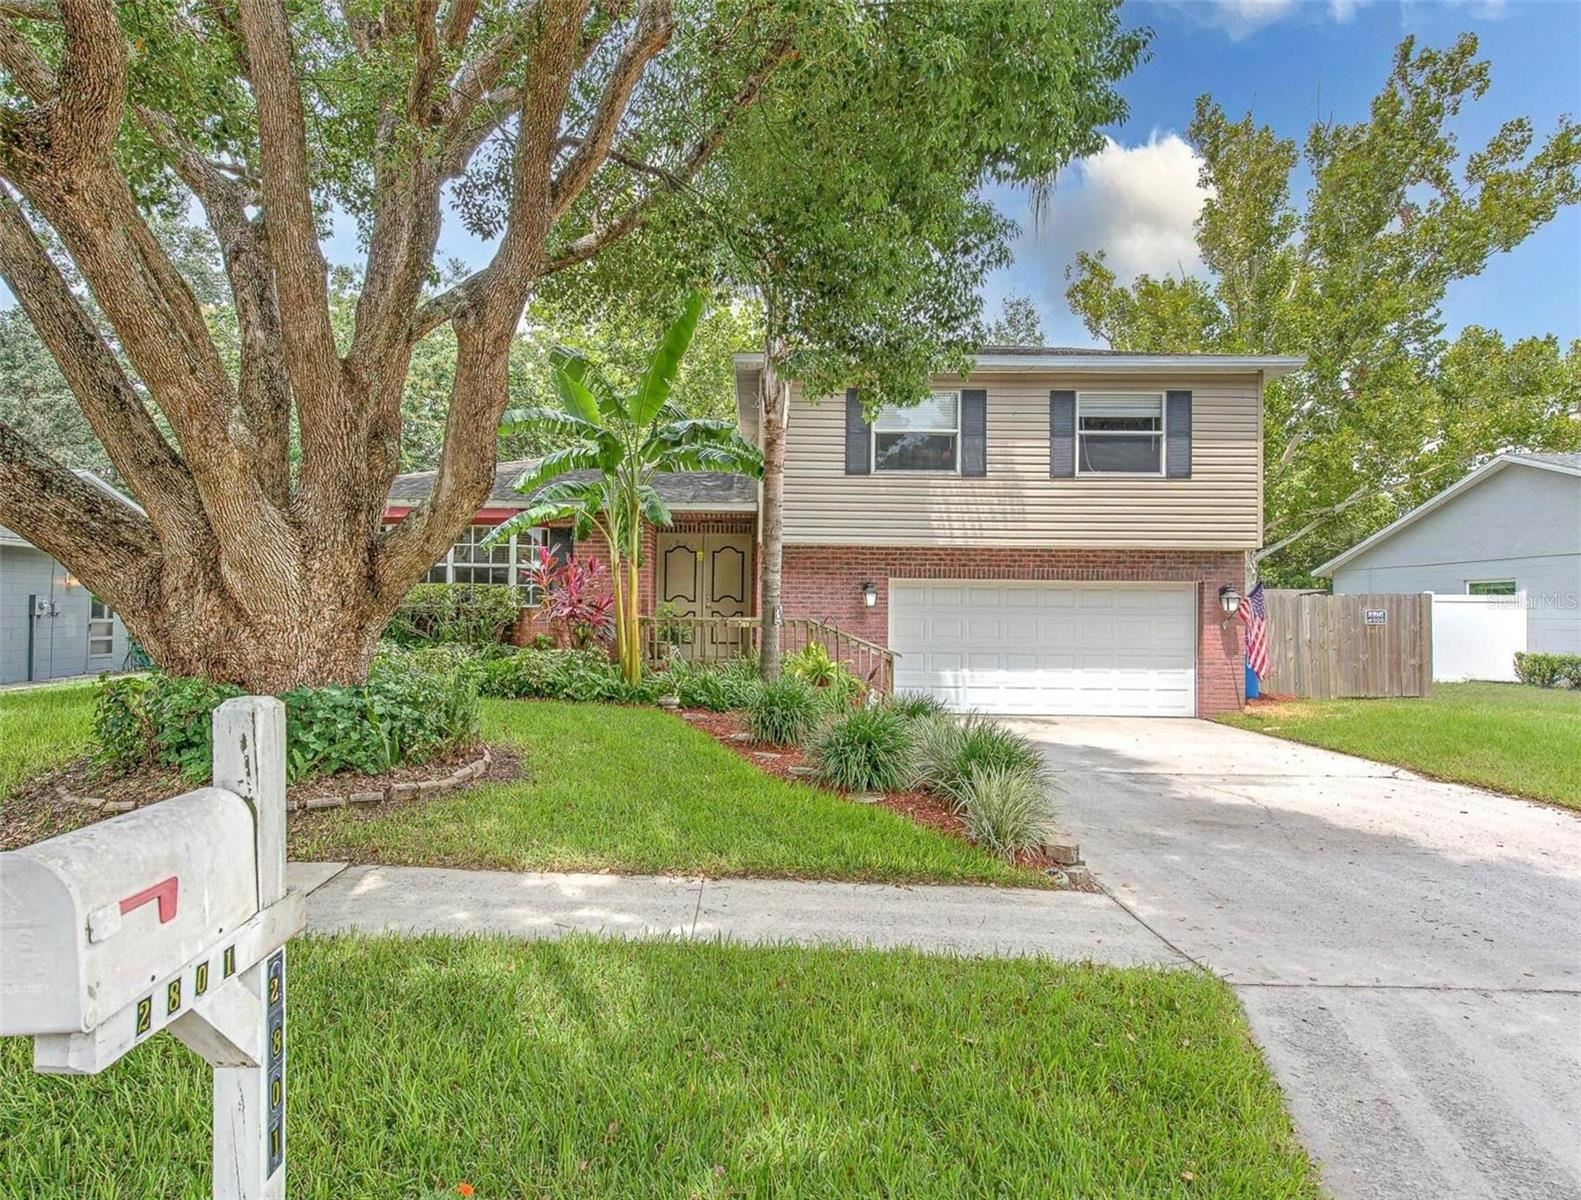 Photo of 2801 LINDEN TREE STREET, SEFFNER, FL 33584 (MLS # T3319520)